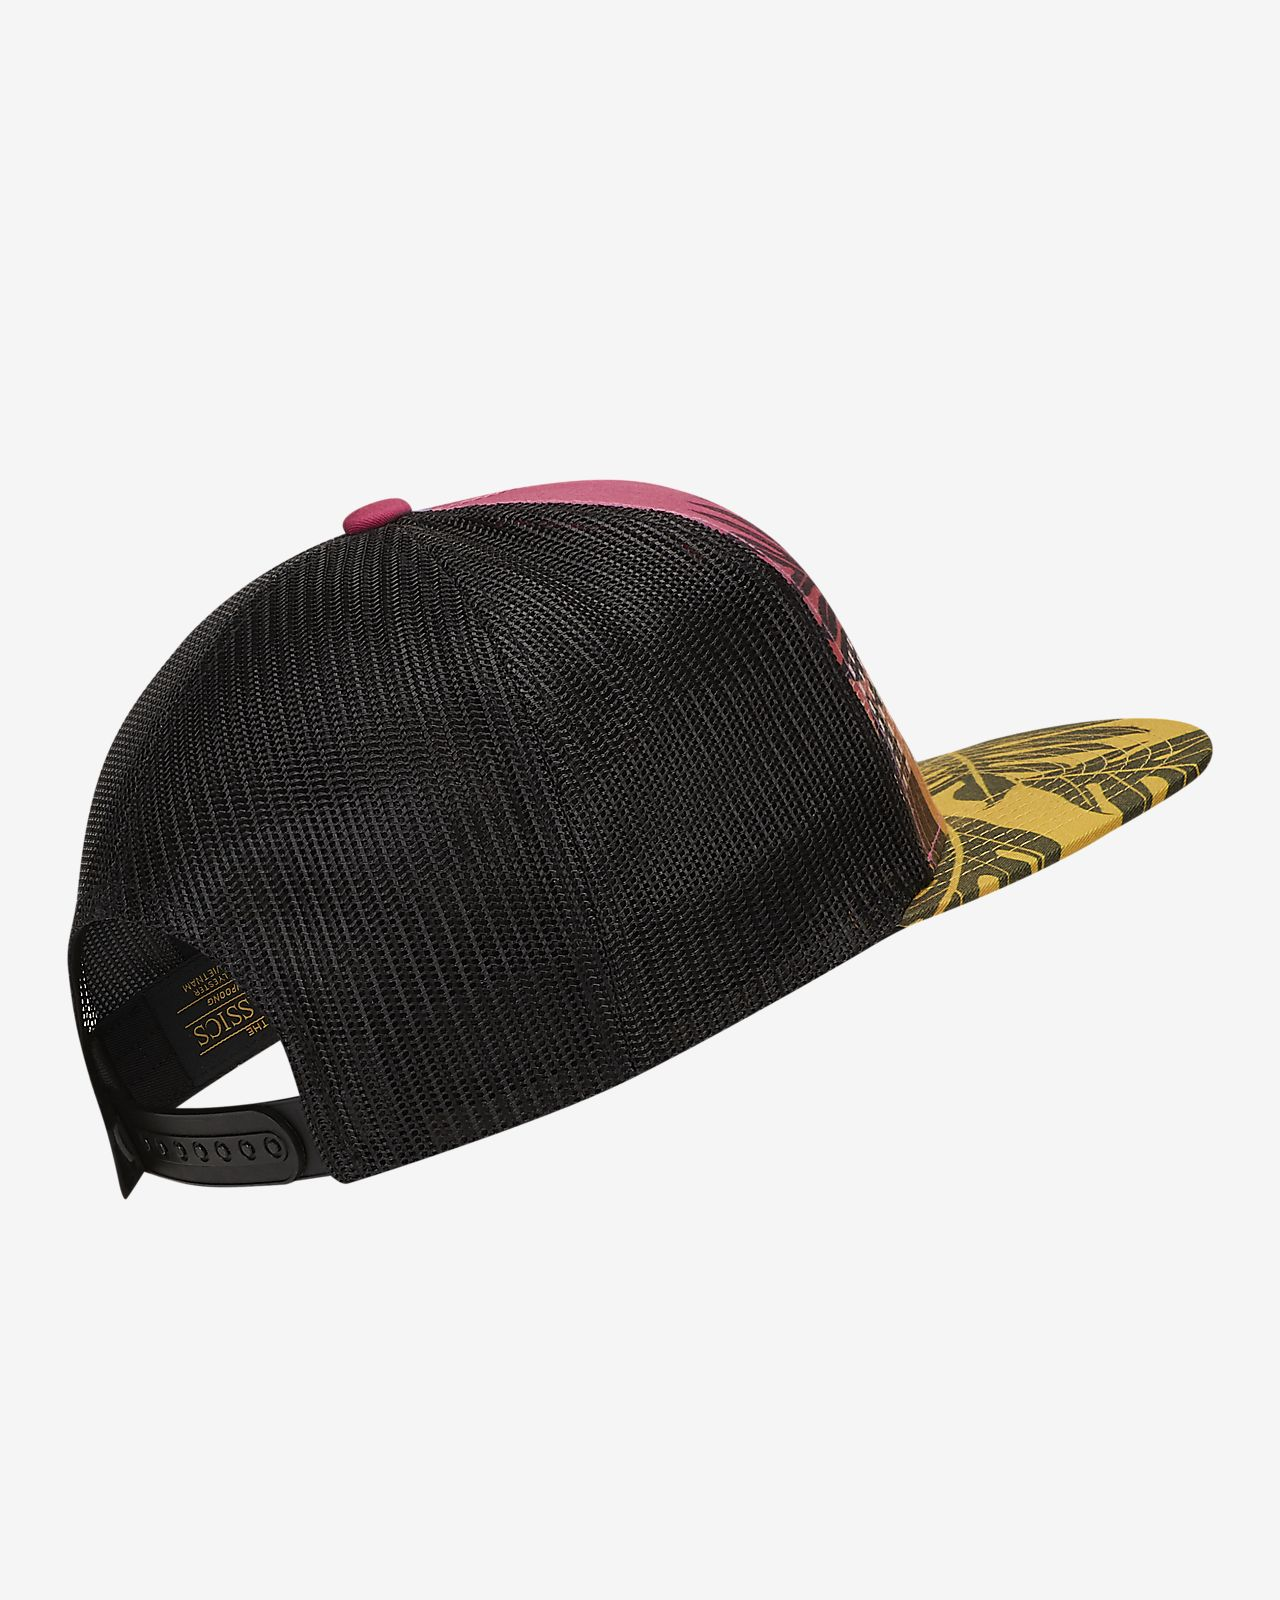 2ed4db719c988 Hurley Sig Zane Moorea Men s Hat. Nike.com SE